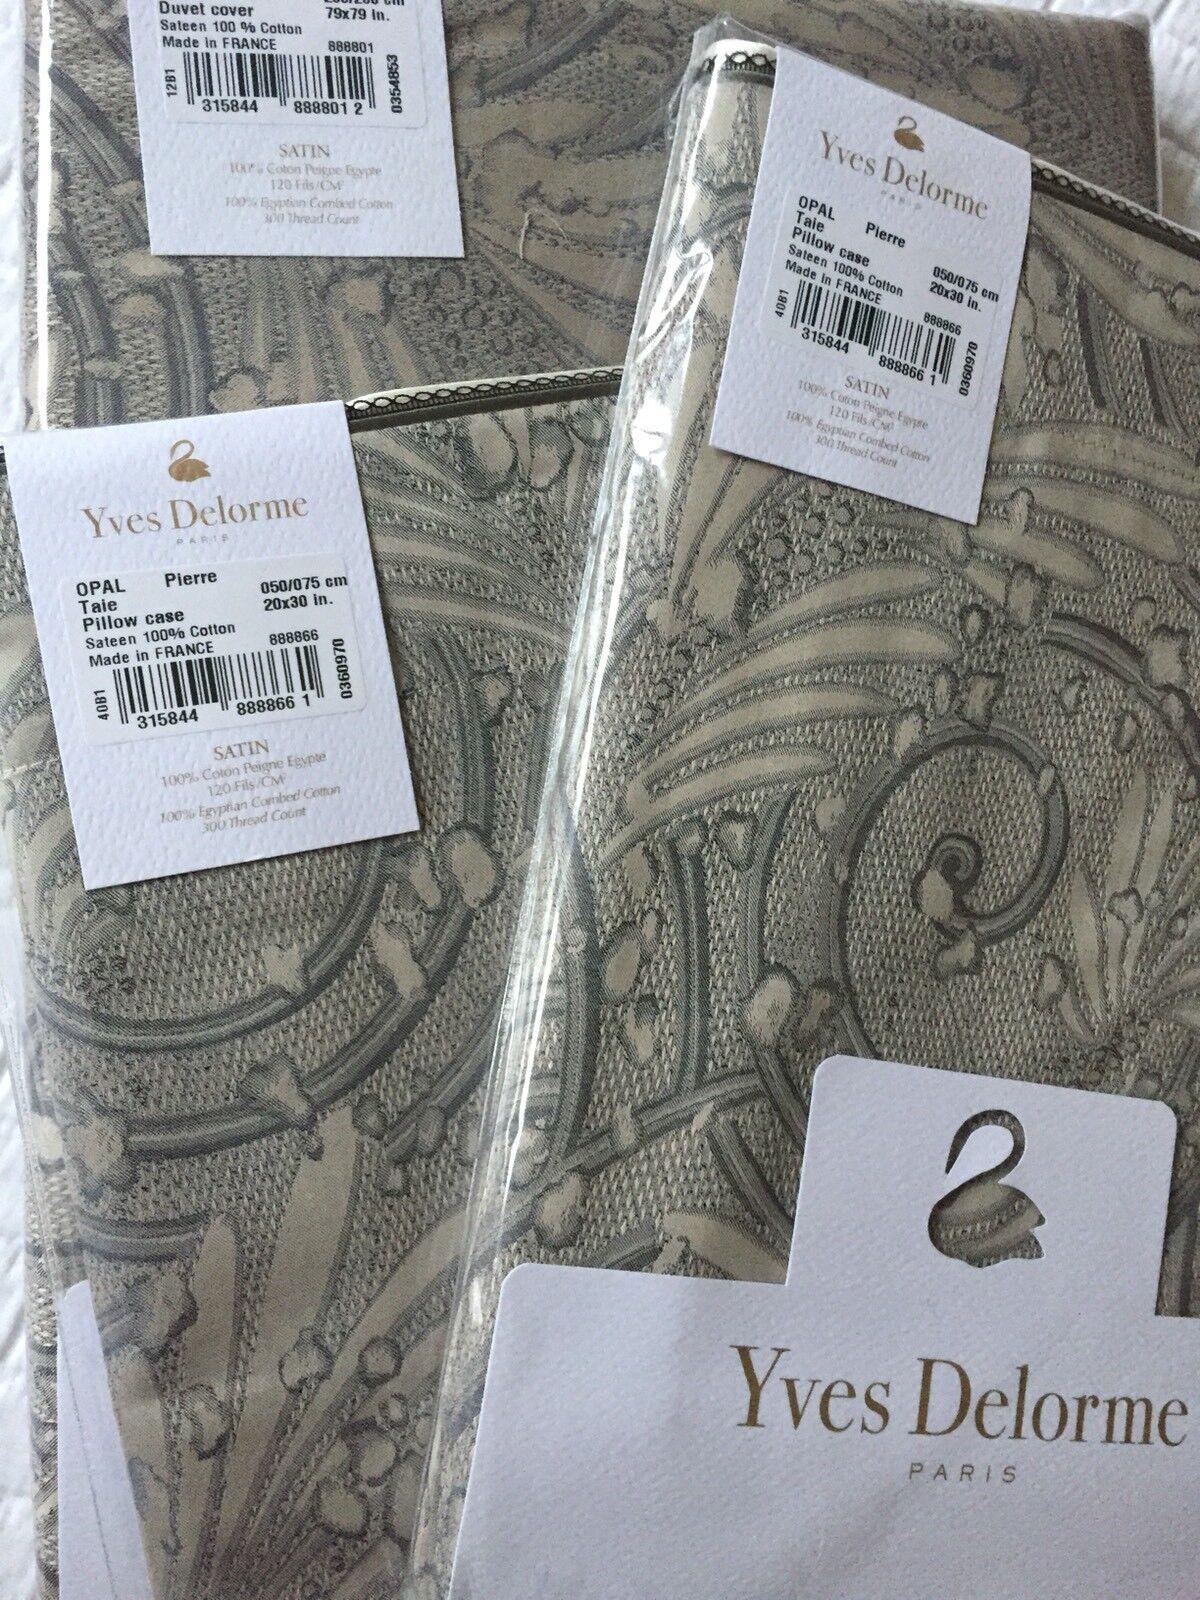 YVES DELORME OPAL PIERRE SATIN Duvet Cover Set DOUBLE